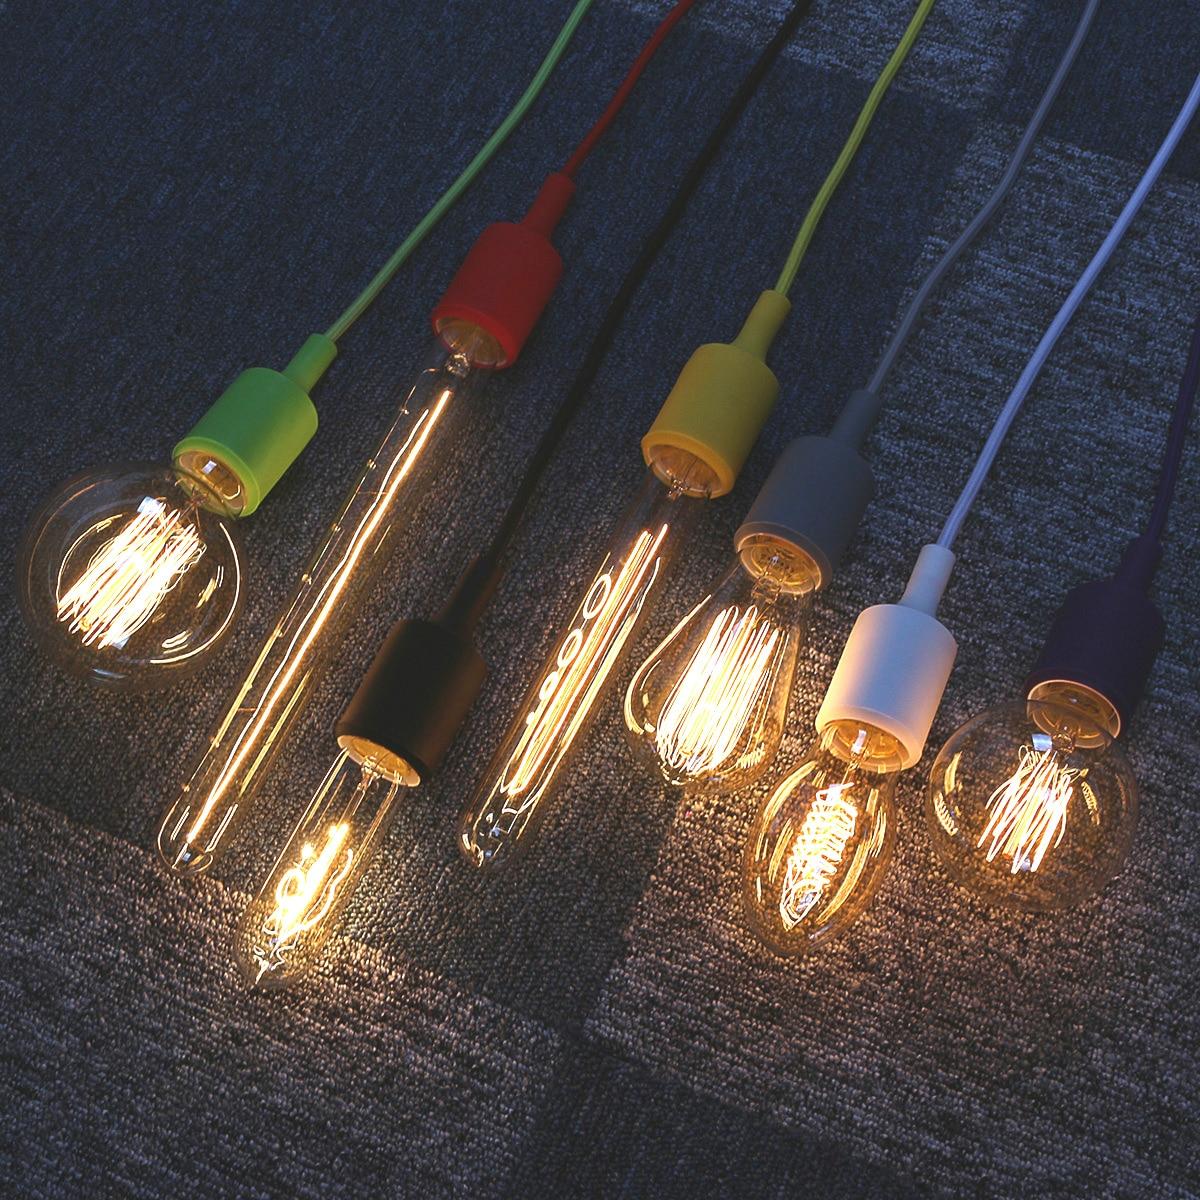 Buy Incandescent Bulb E27 40w Ac 110v T45 Tungsten: Aliexpress.com : Buy E27 40W LED Bulbs Filament Light